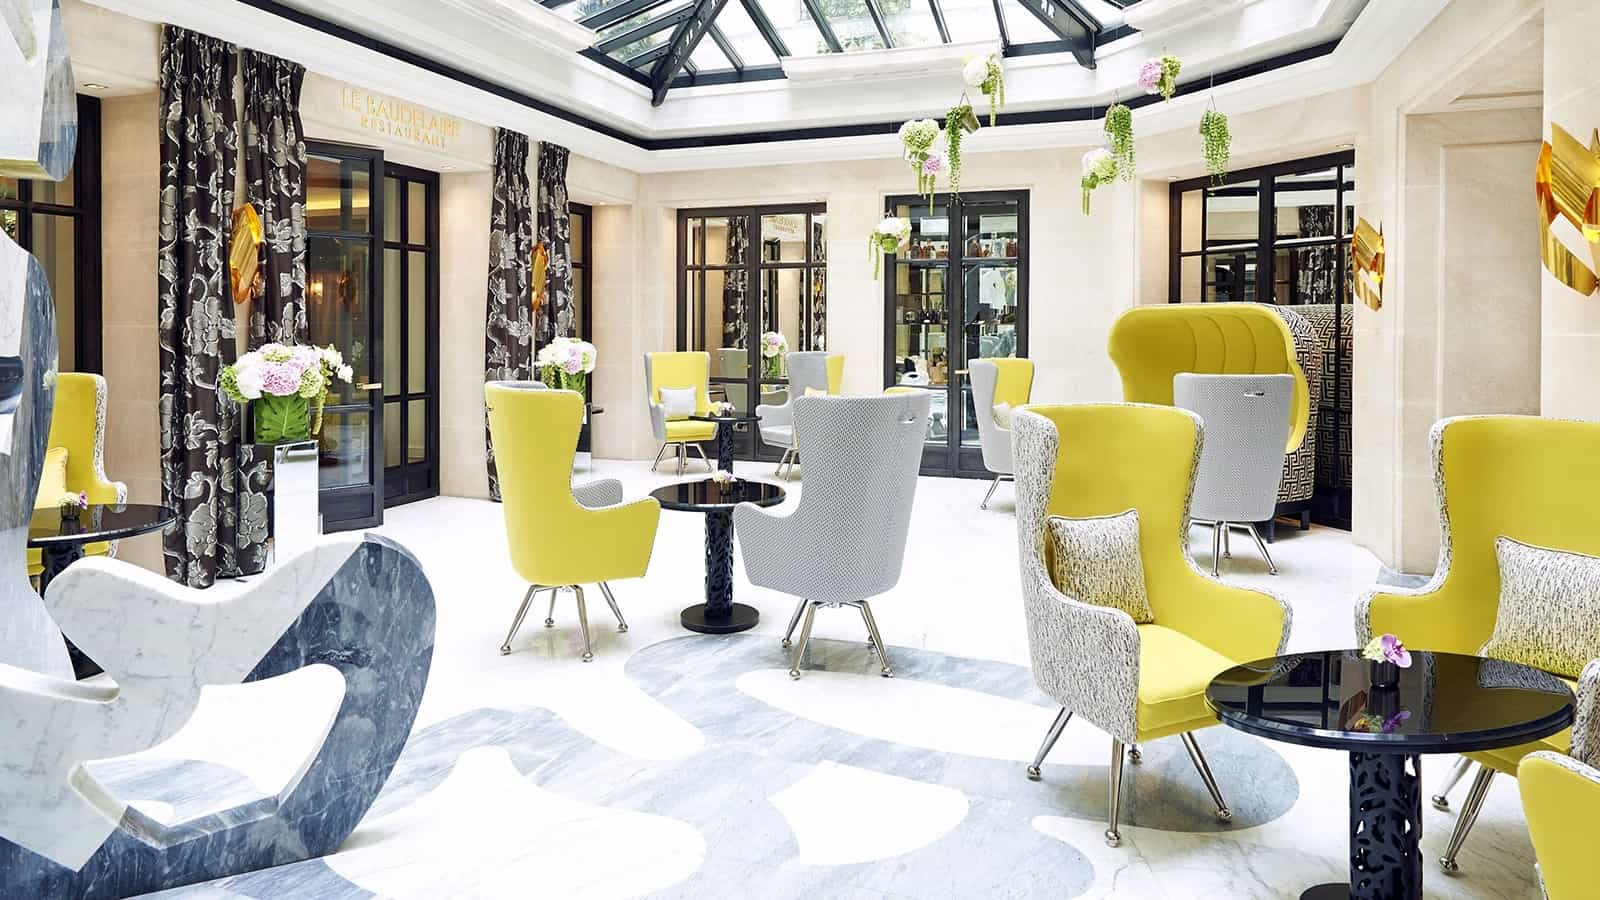 hotel-le-burgundy-paris-accueil-ajg menuiserie